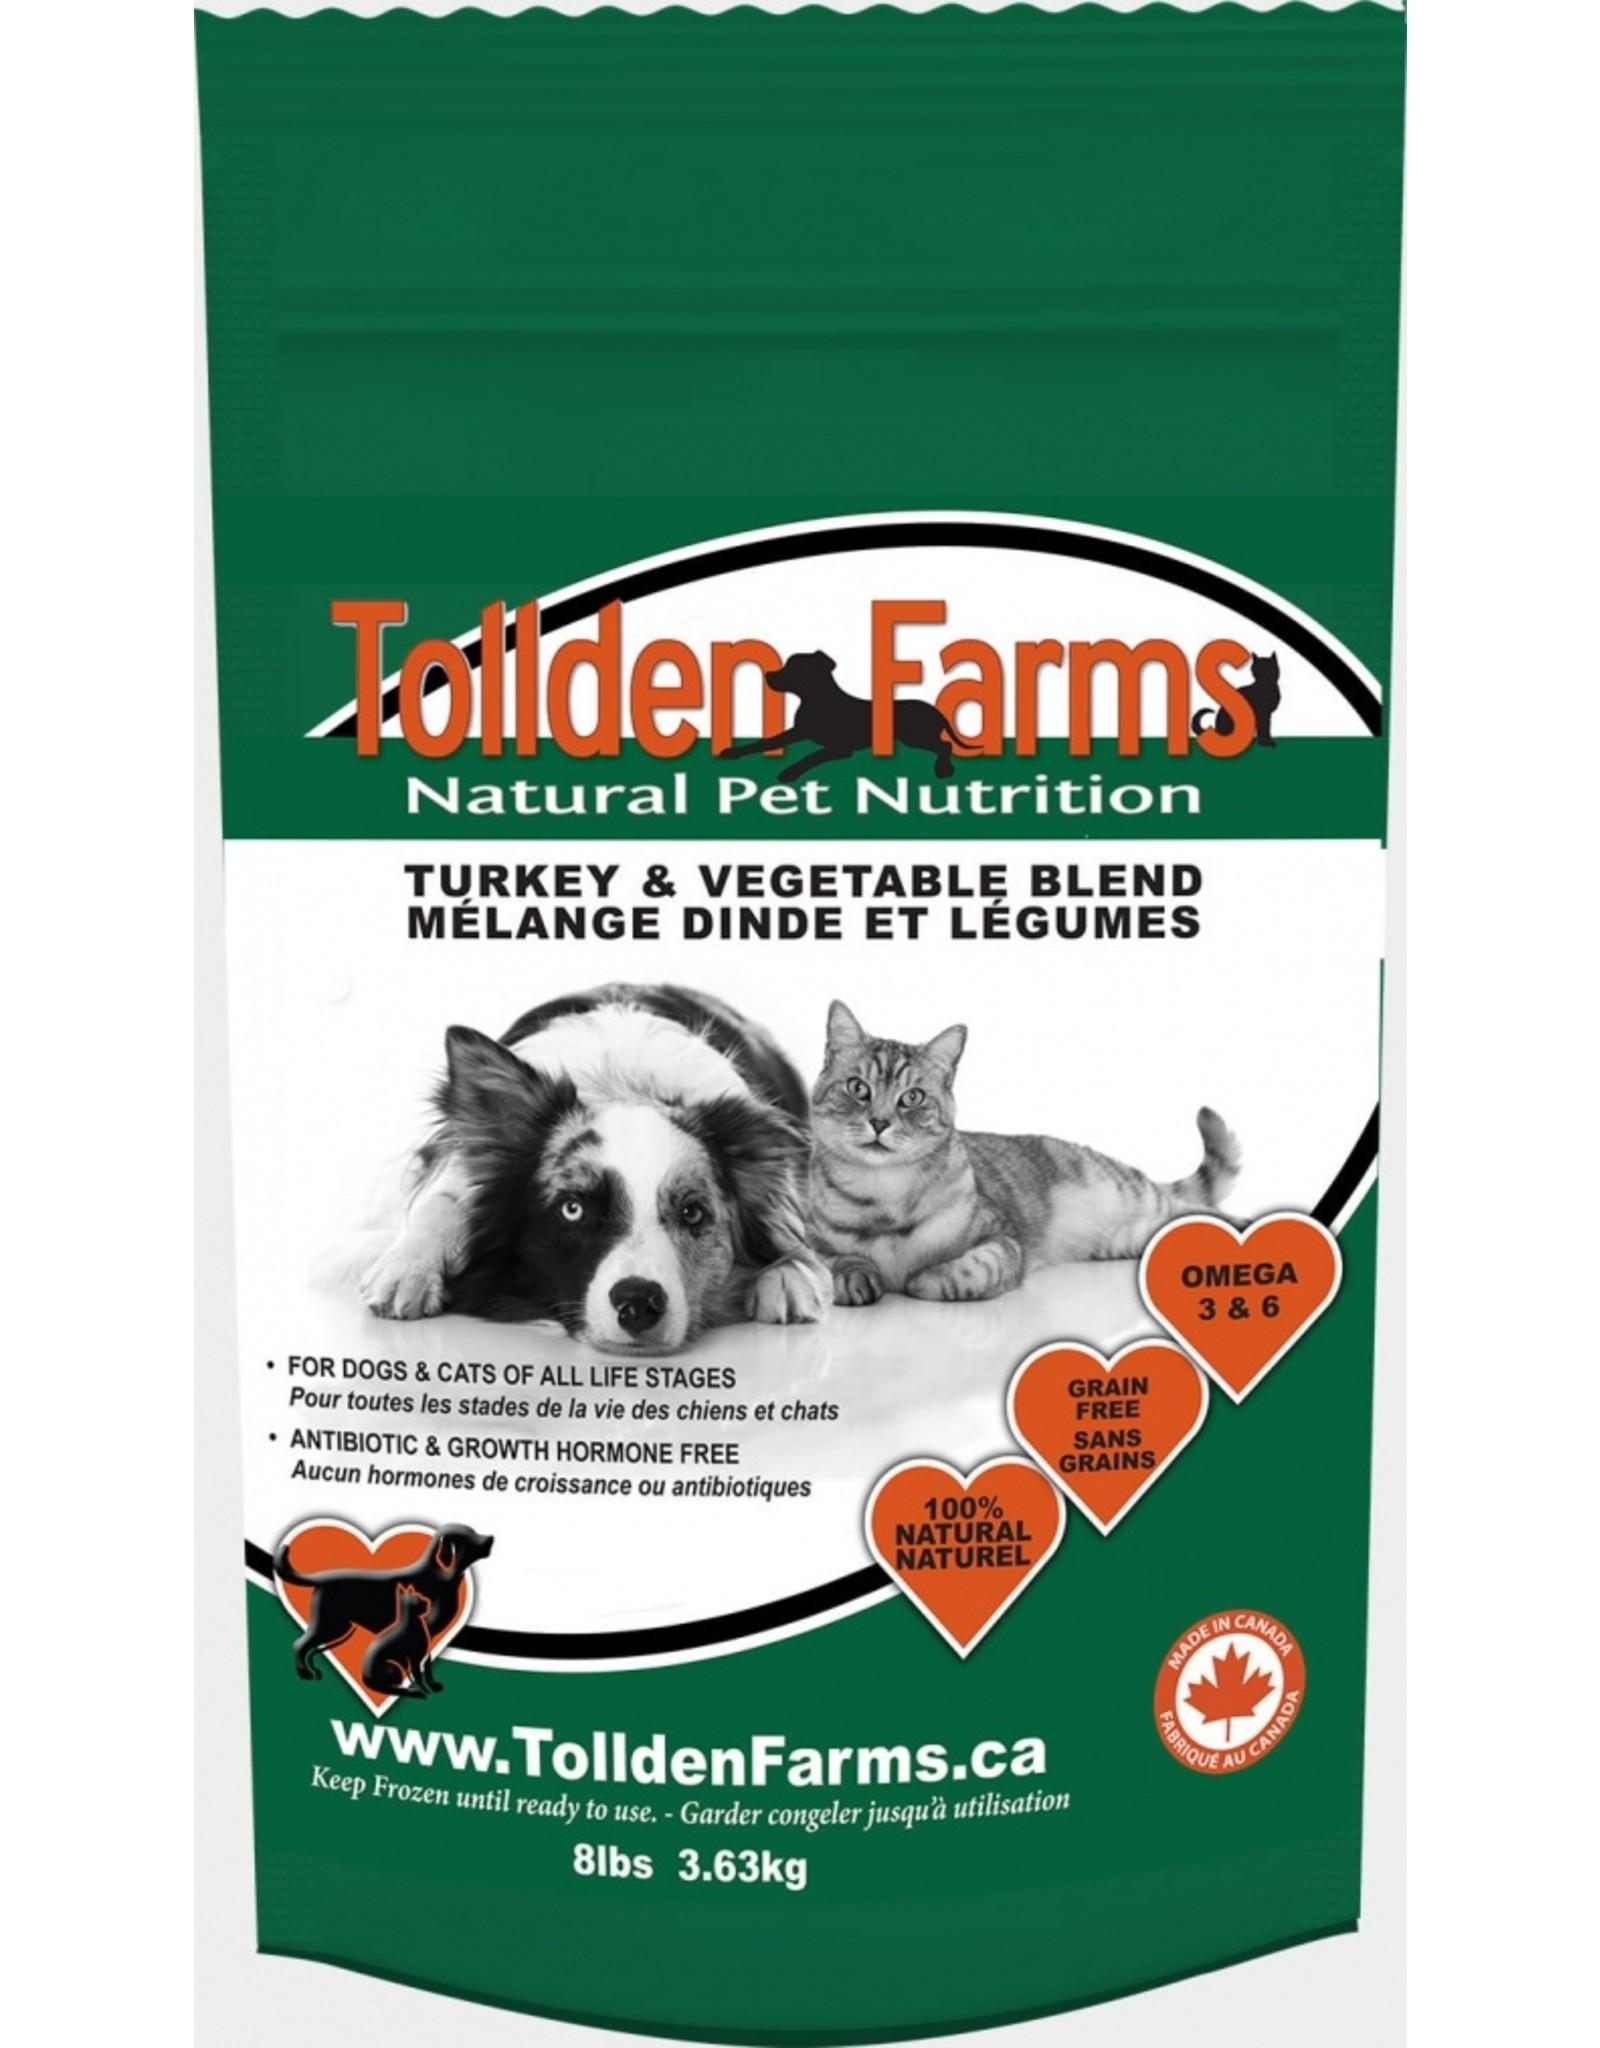 Tollden Tollden Farms Turkey and Vegetable Blend 8lb (16 8oz patties)